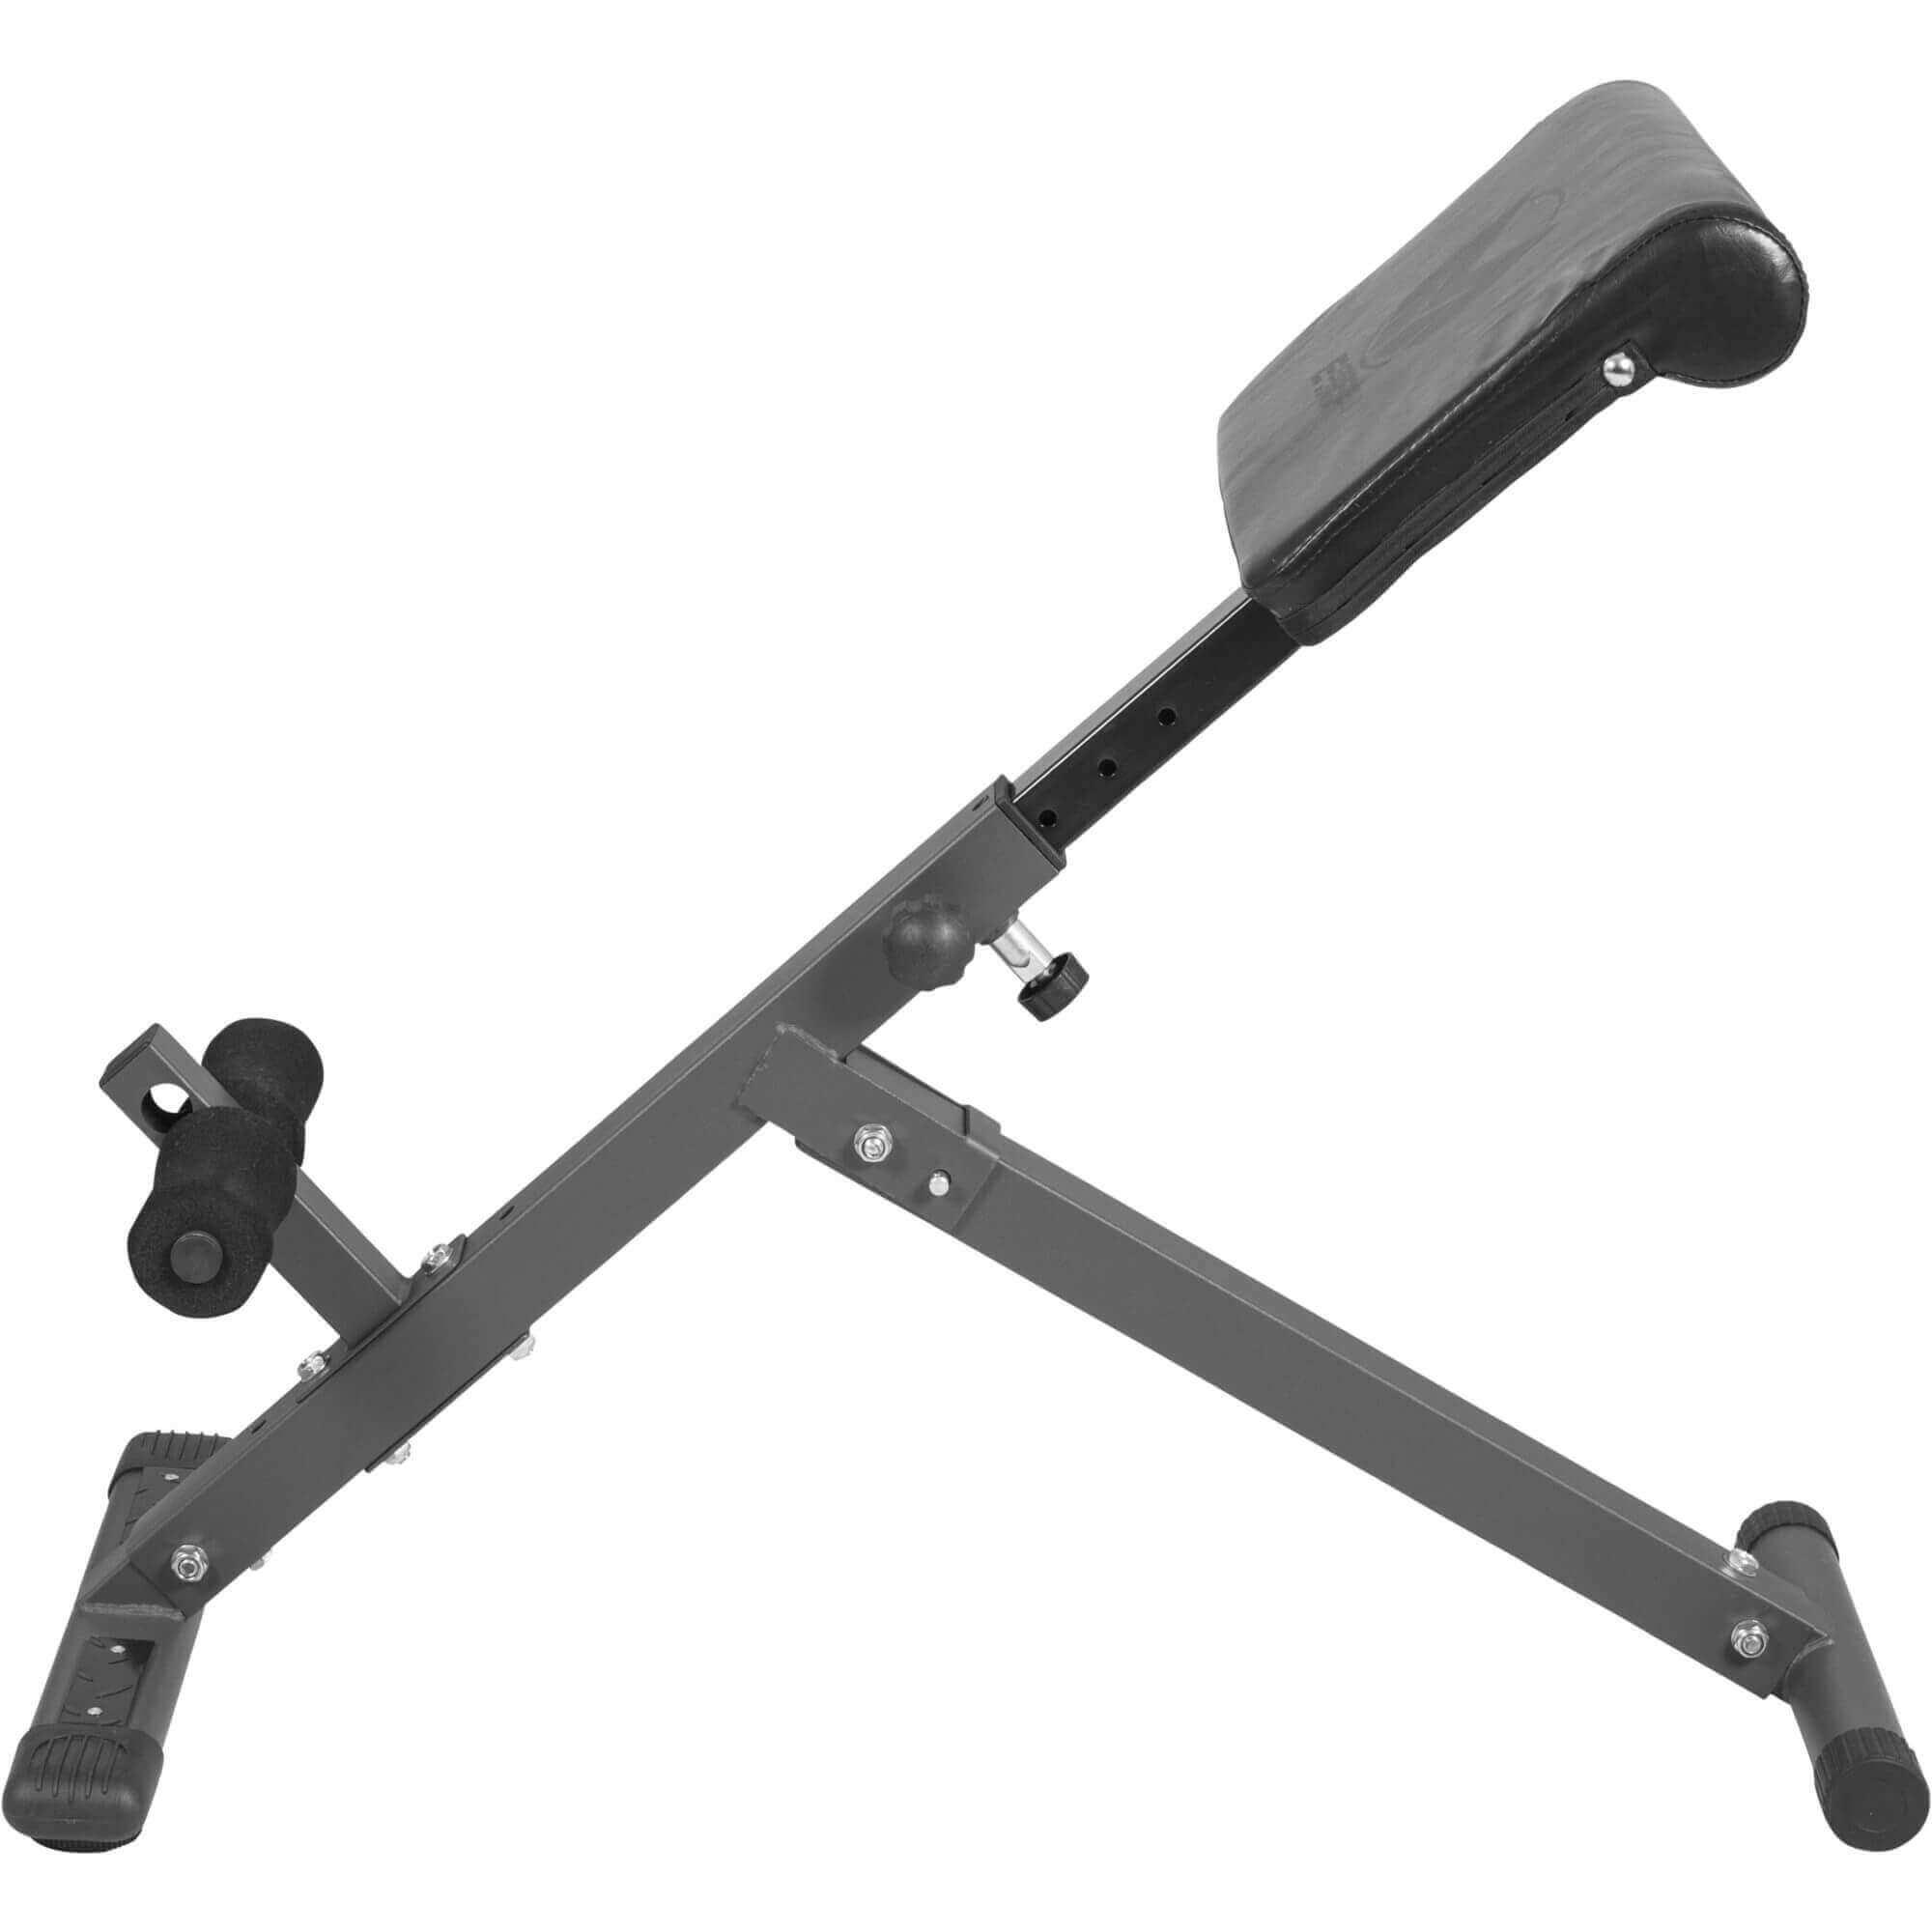 Fahrrad-Ketten-Teiler-Scherblock Reparatur Tool O8H1